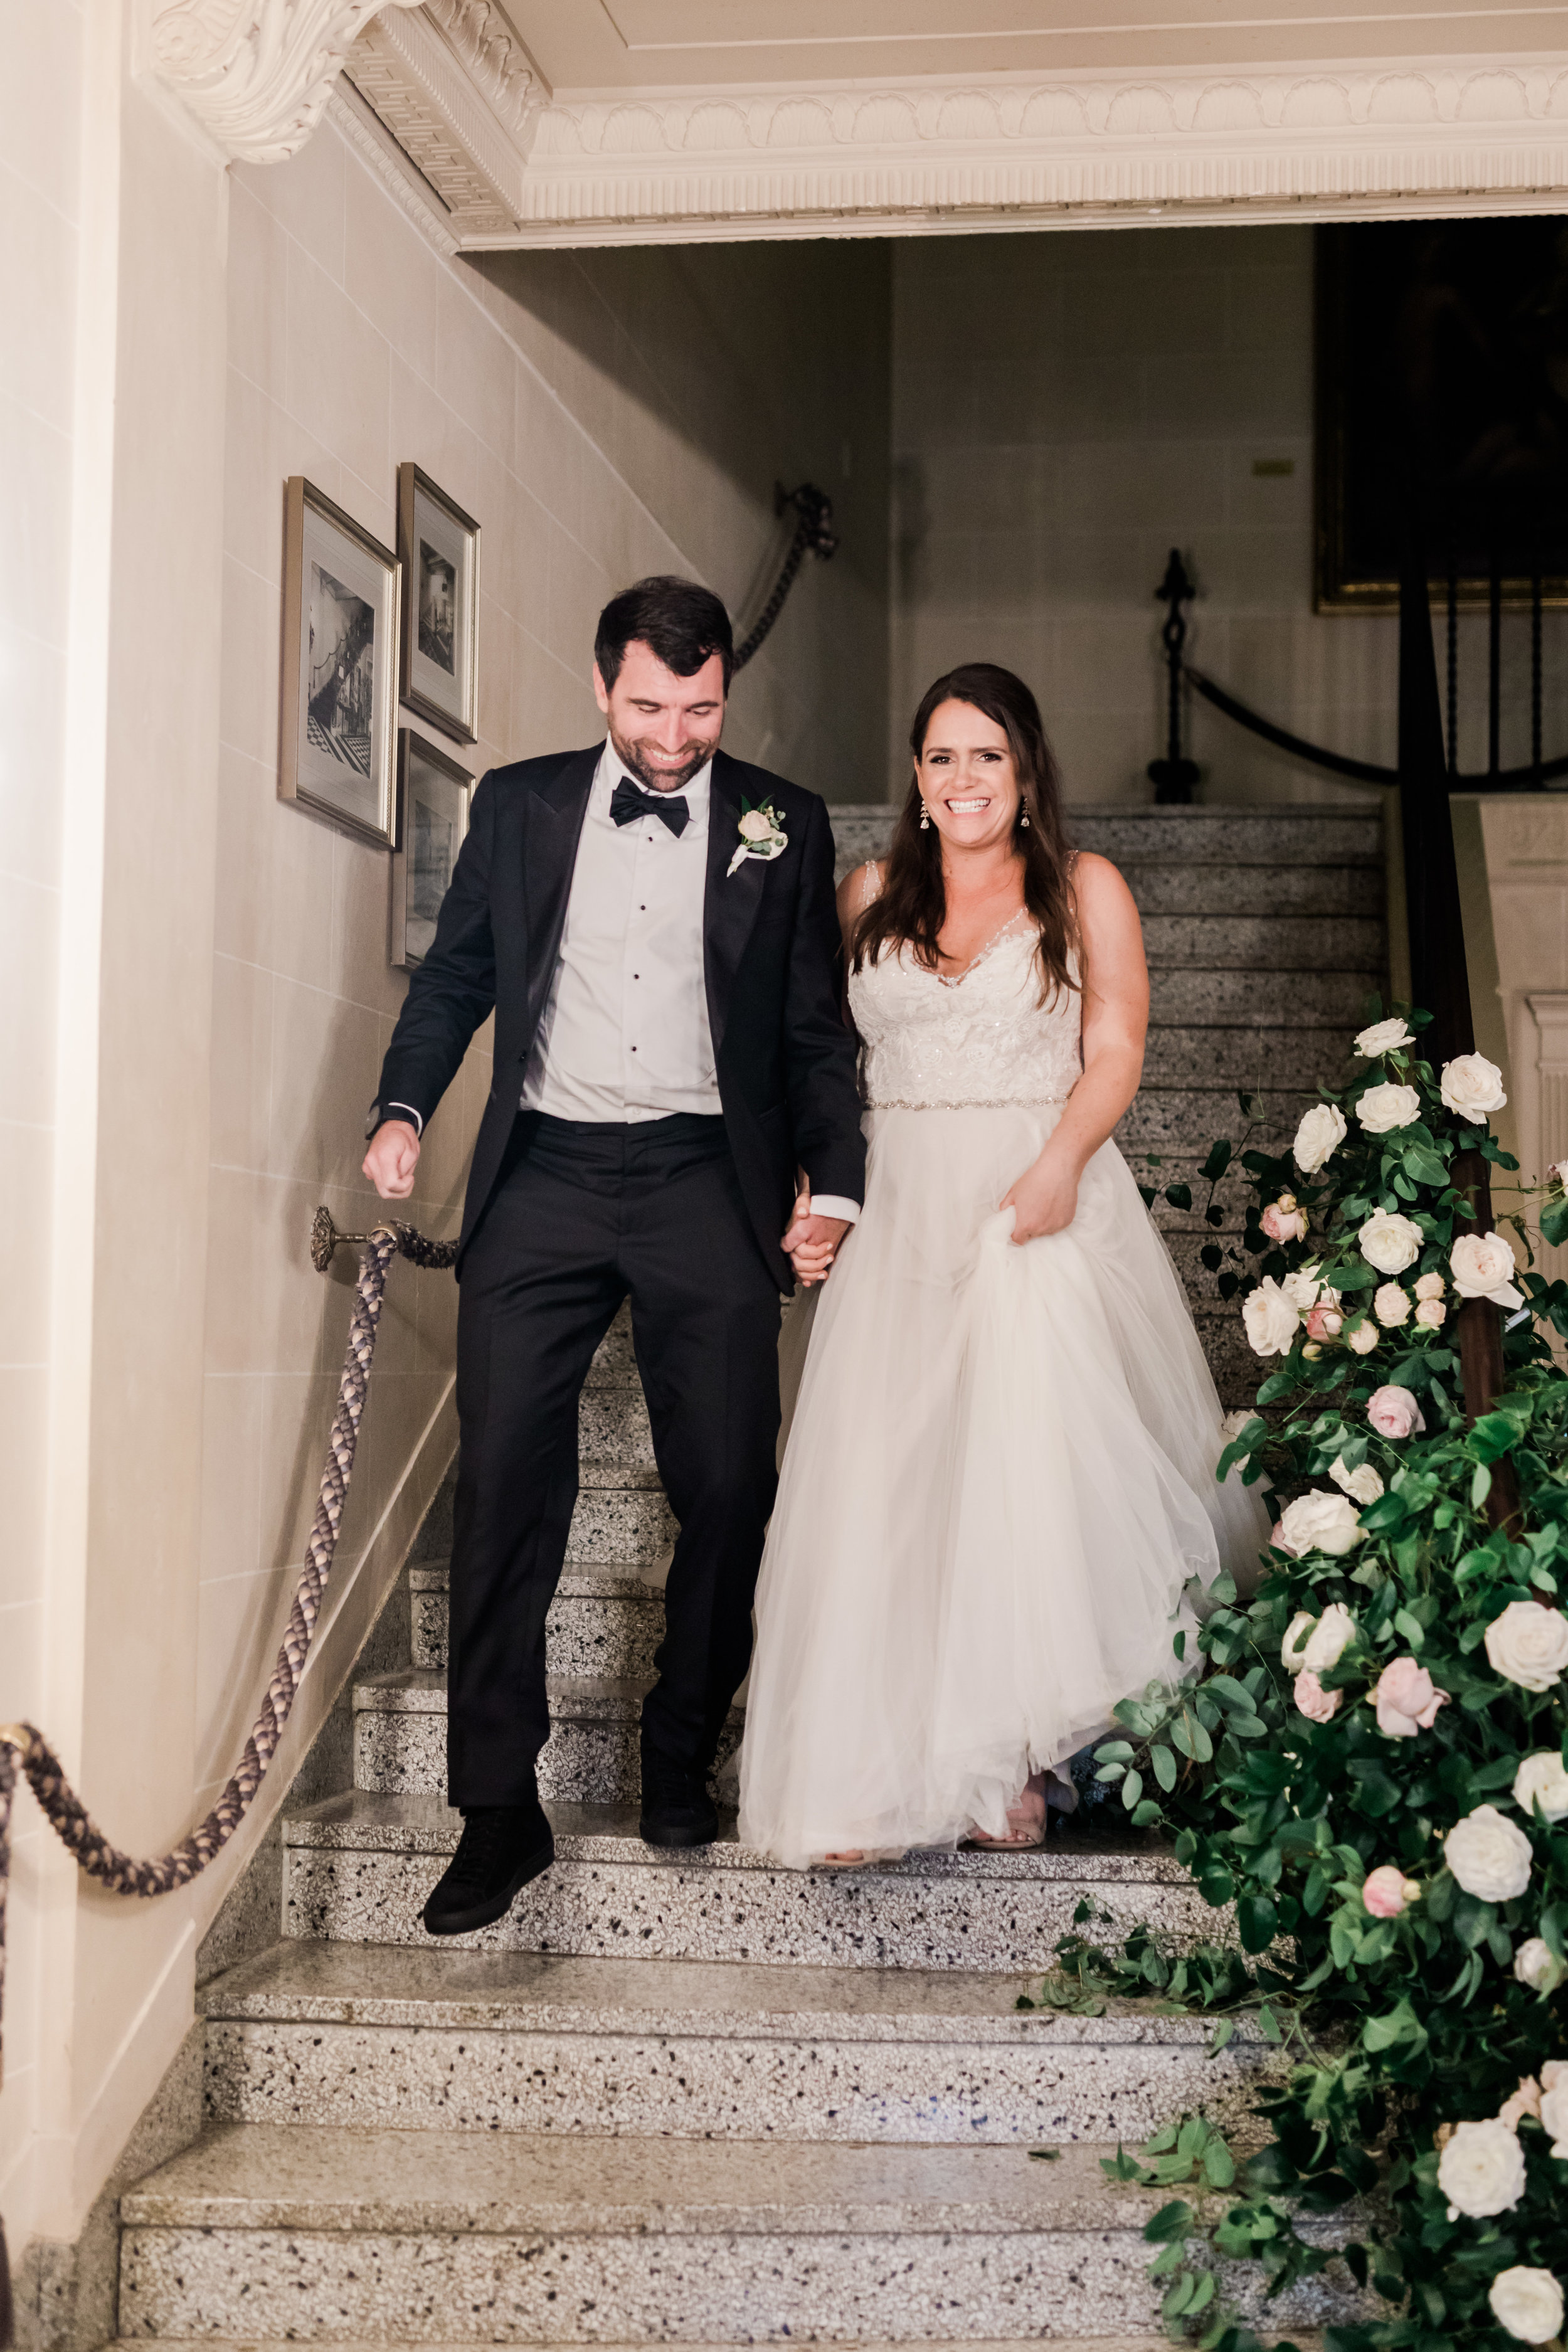 The Mansion at Woodward Park Tulsa Oklahoma Wedding_Valorie Darling Photography-0272.jpg